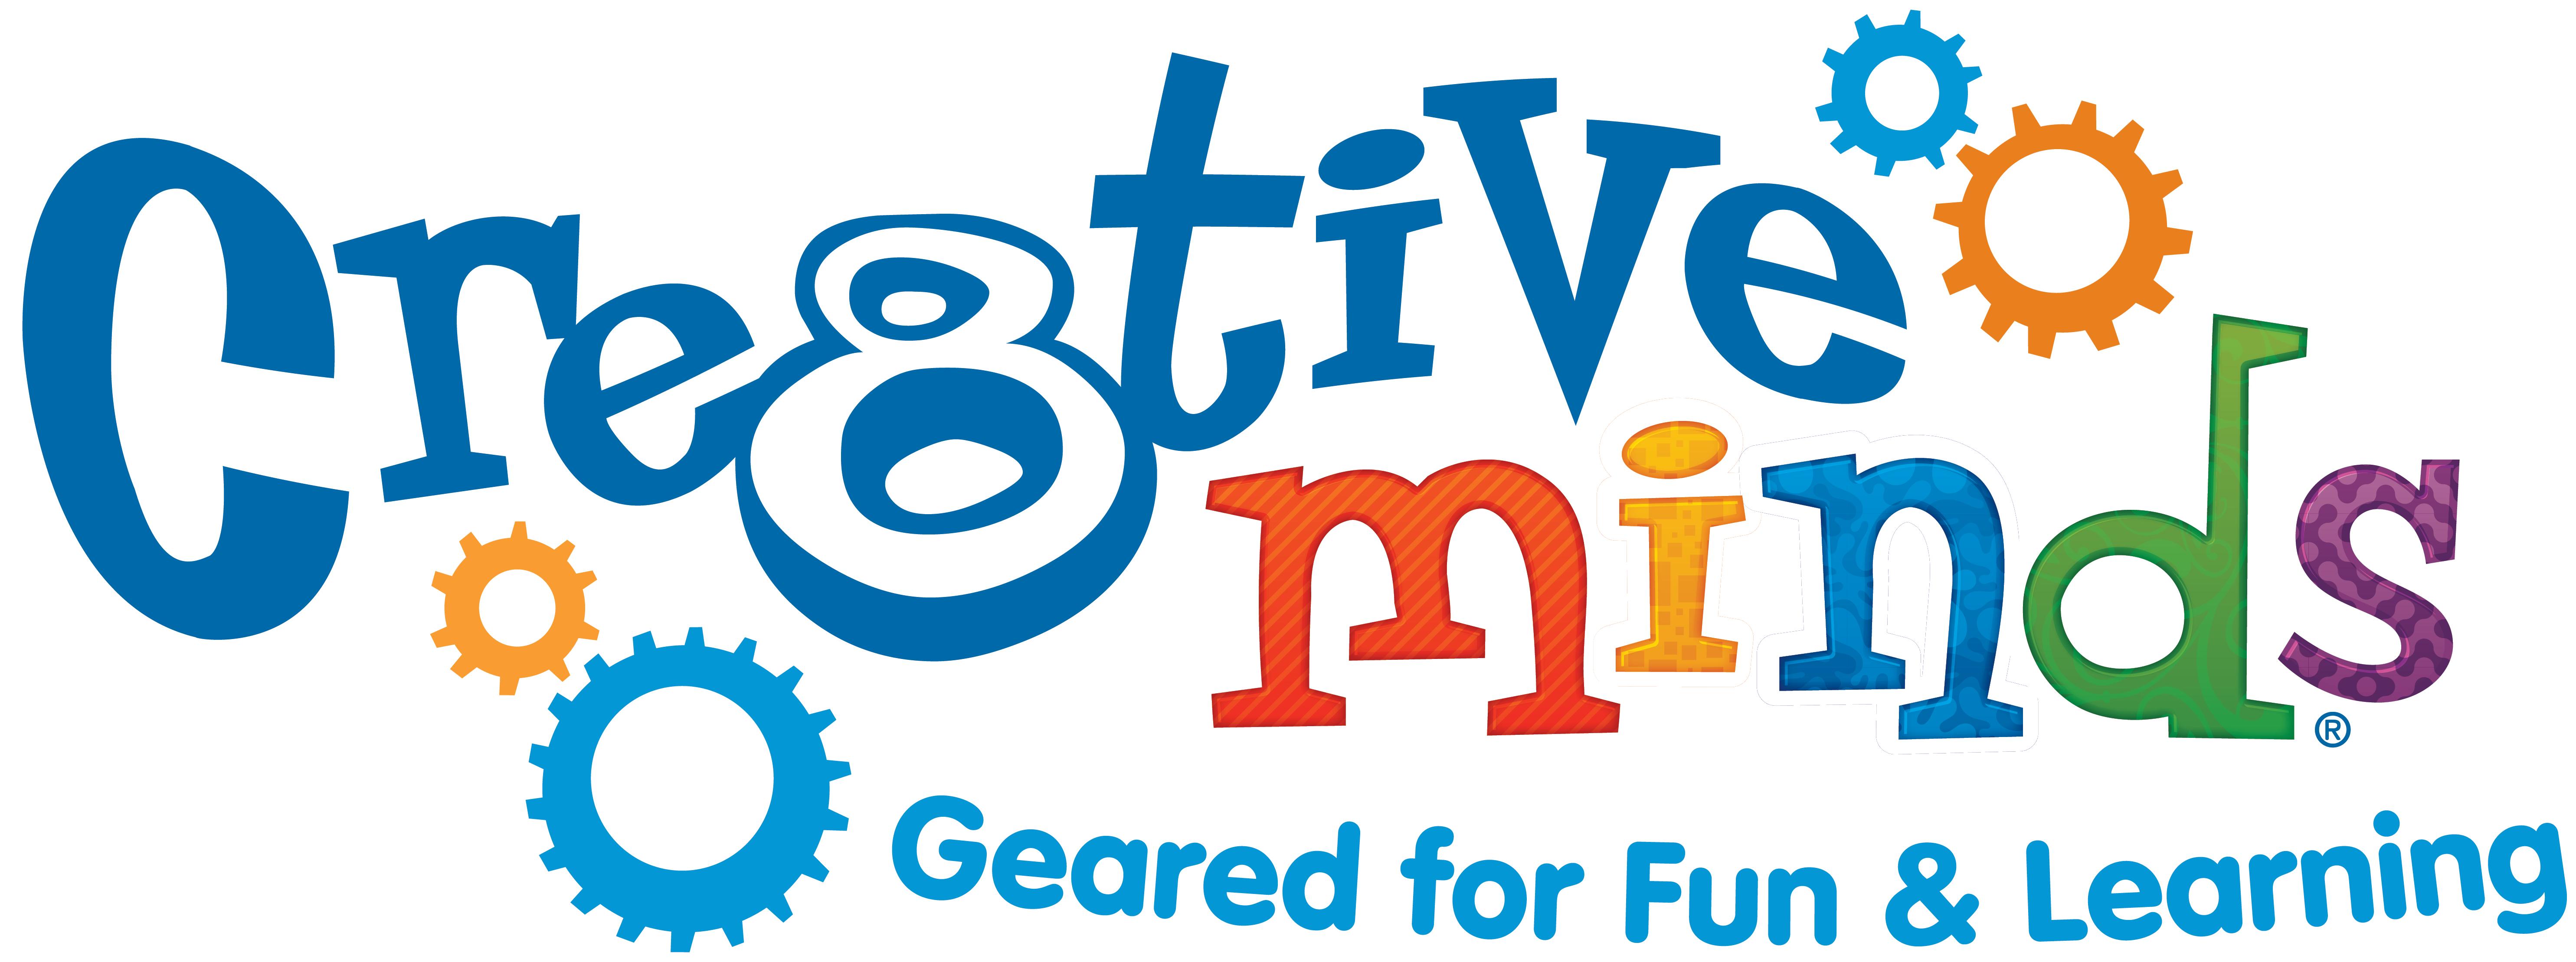 Cre8tive Minds